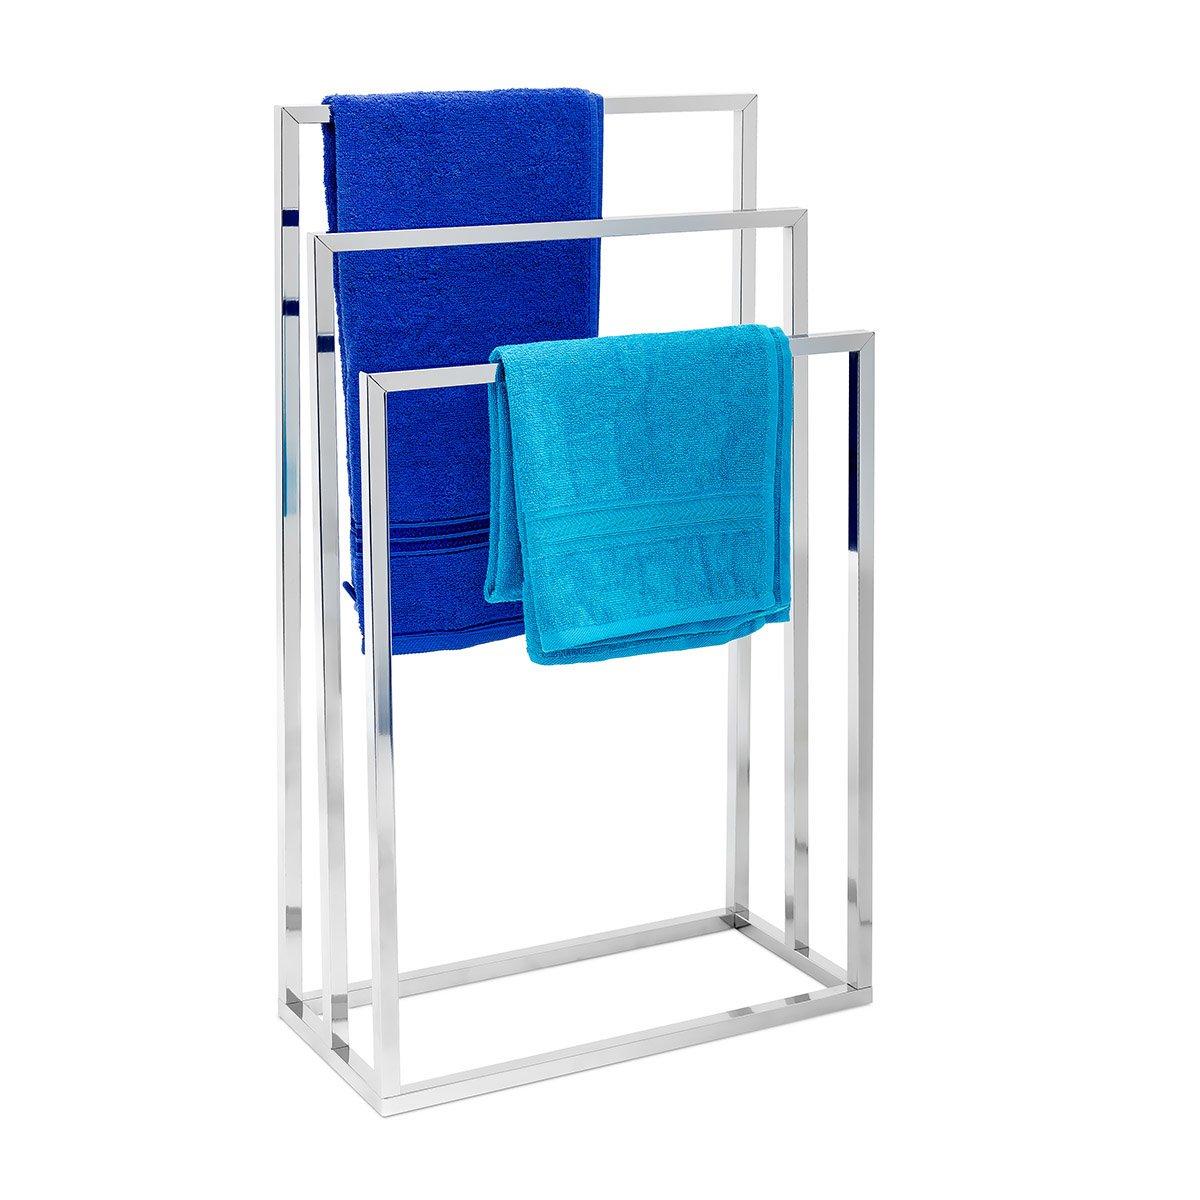 relaxdays 10019256 porte serviettes sur pied avec base antid rapante 3 bras chrom s en 3. Black Bedroom Furniture Sets. Home Design Ideas